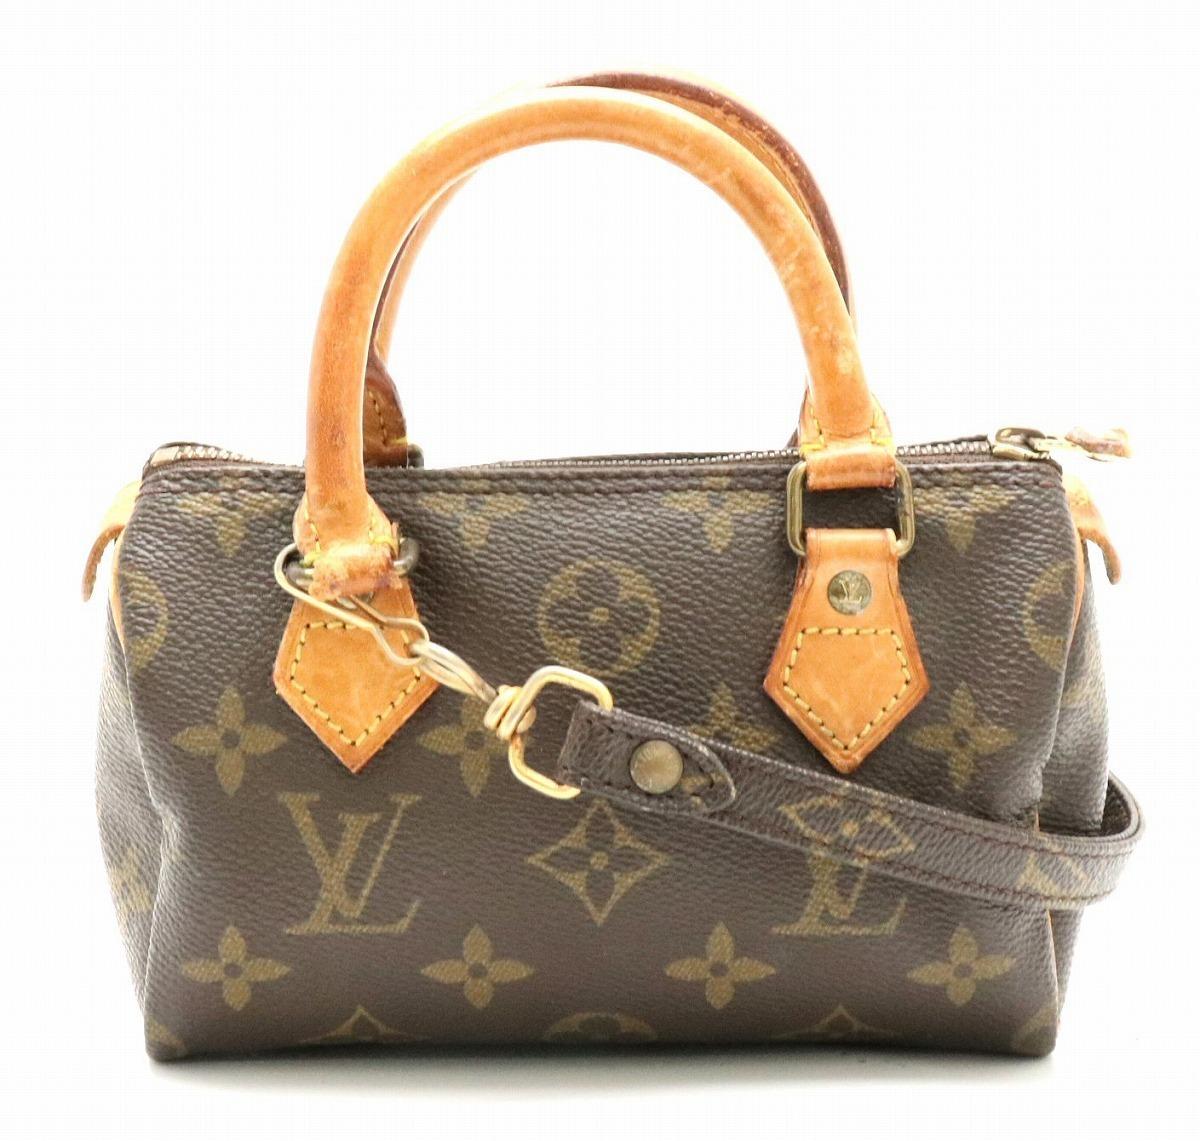 d92ae3dac973 Louis Vuitton Monogram Mini Speedy 2 Way Handbag